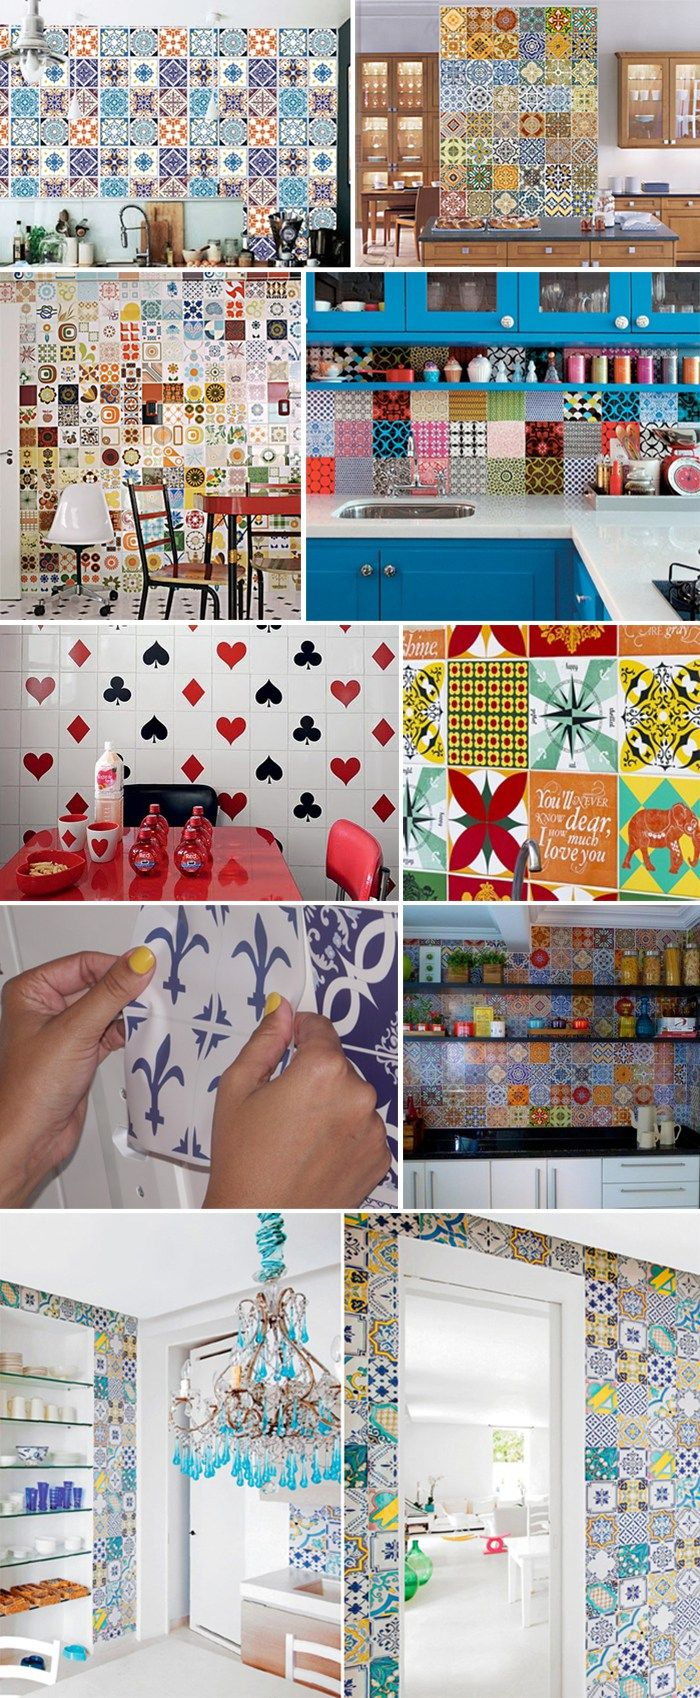 17 mejores ideas sobre pintando azulejos de ba o en for Azulejo sobre azulejo